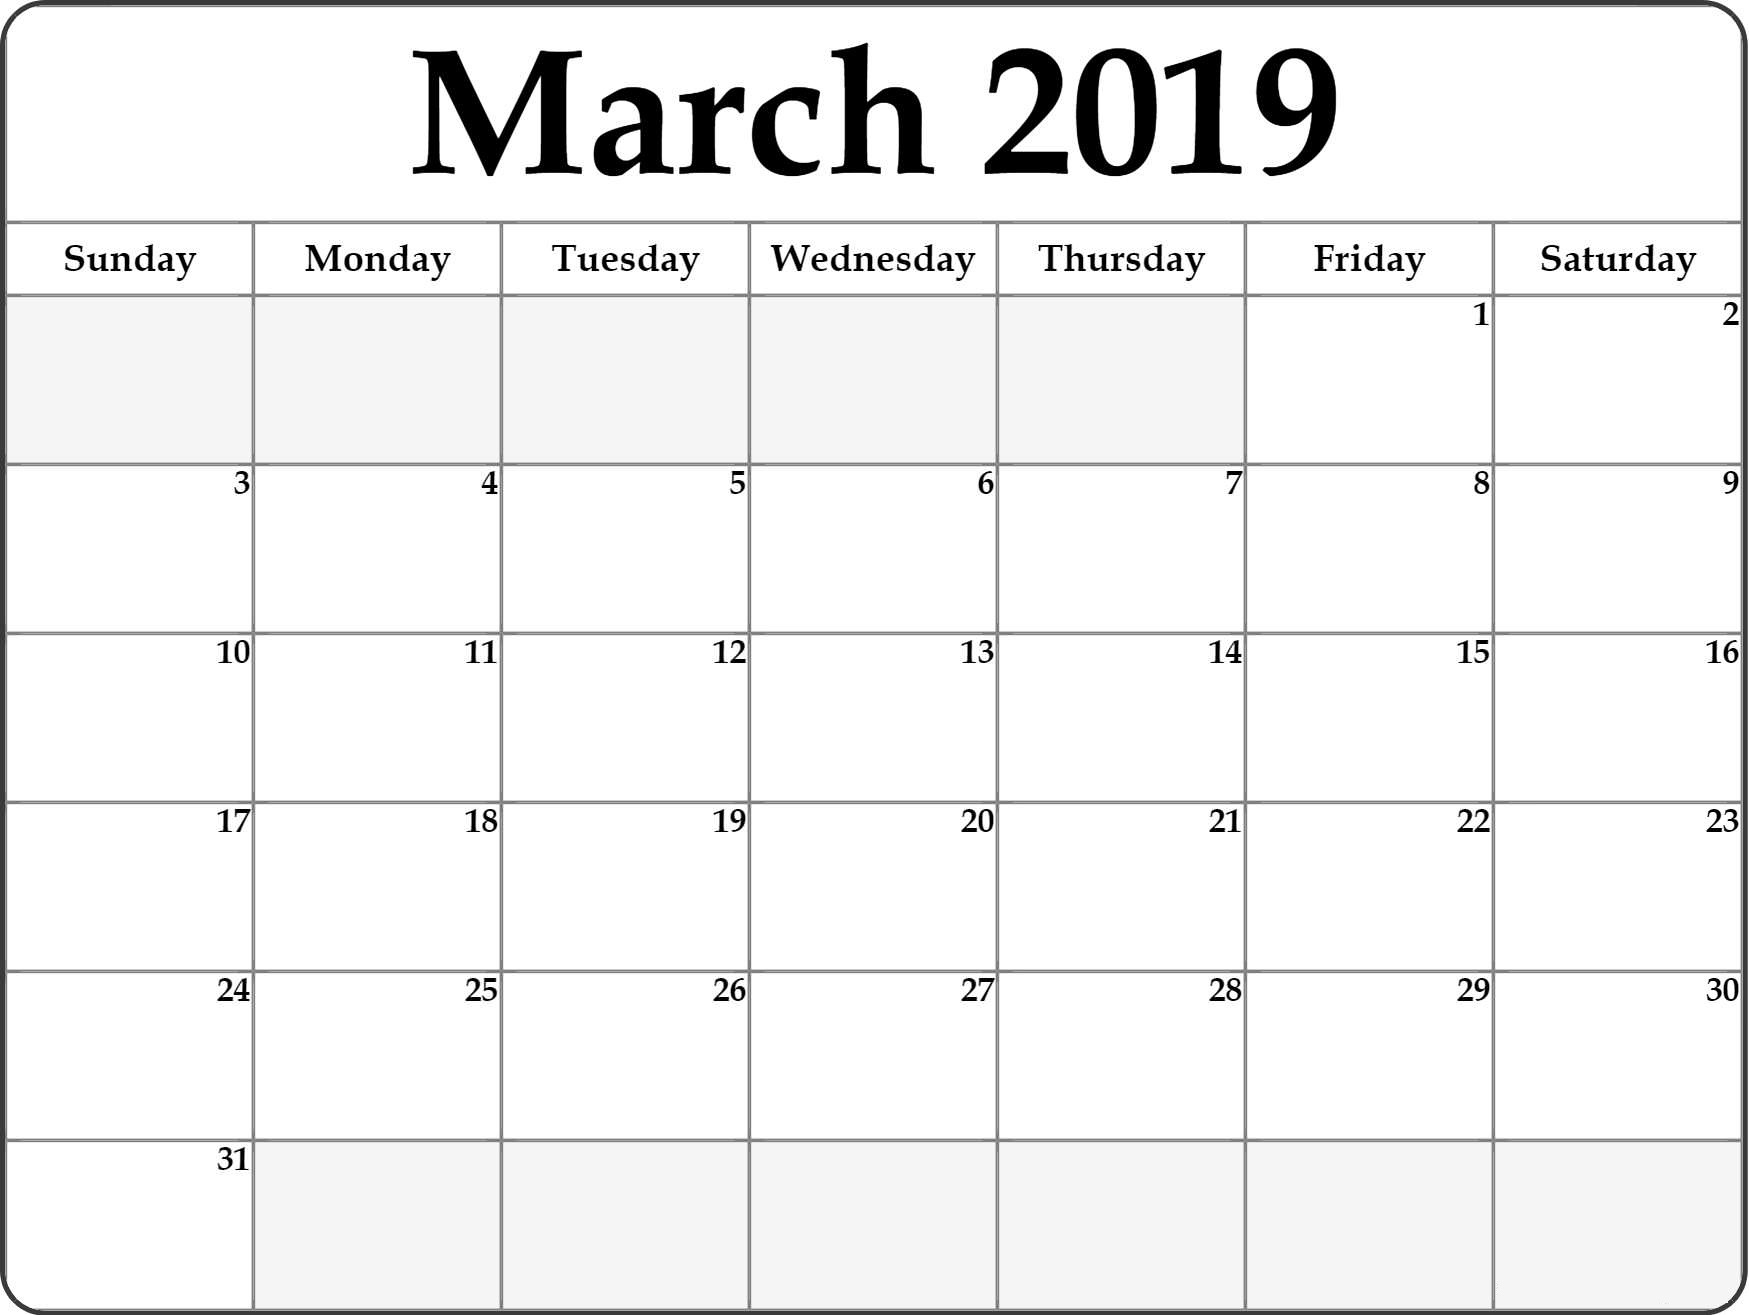 Blank March 2019 Calendar Printable - Free Printable